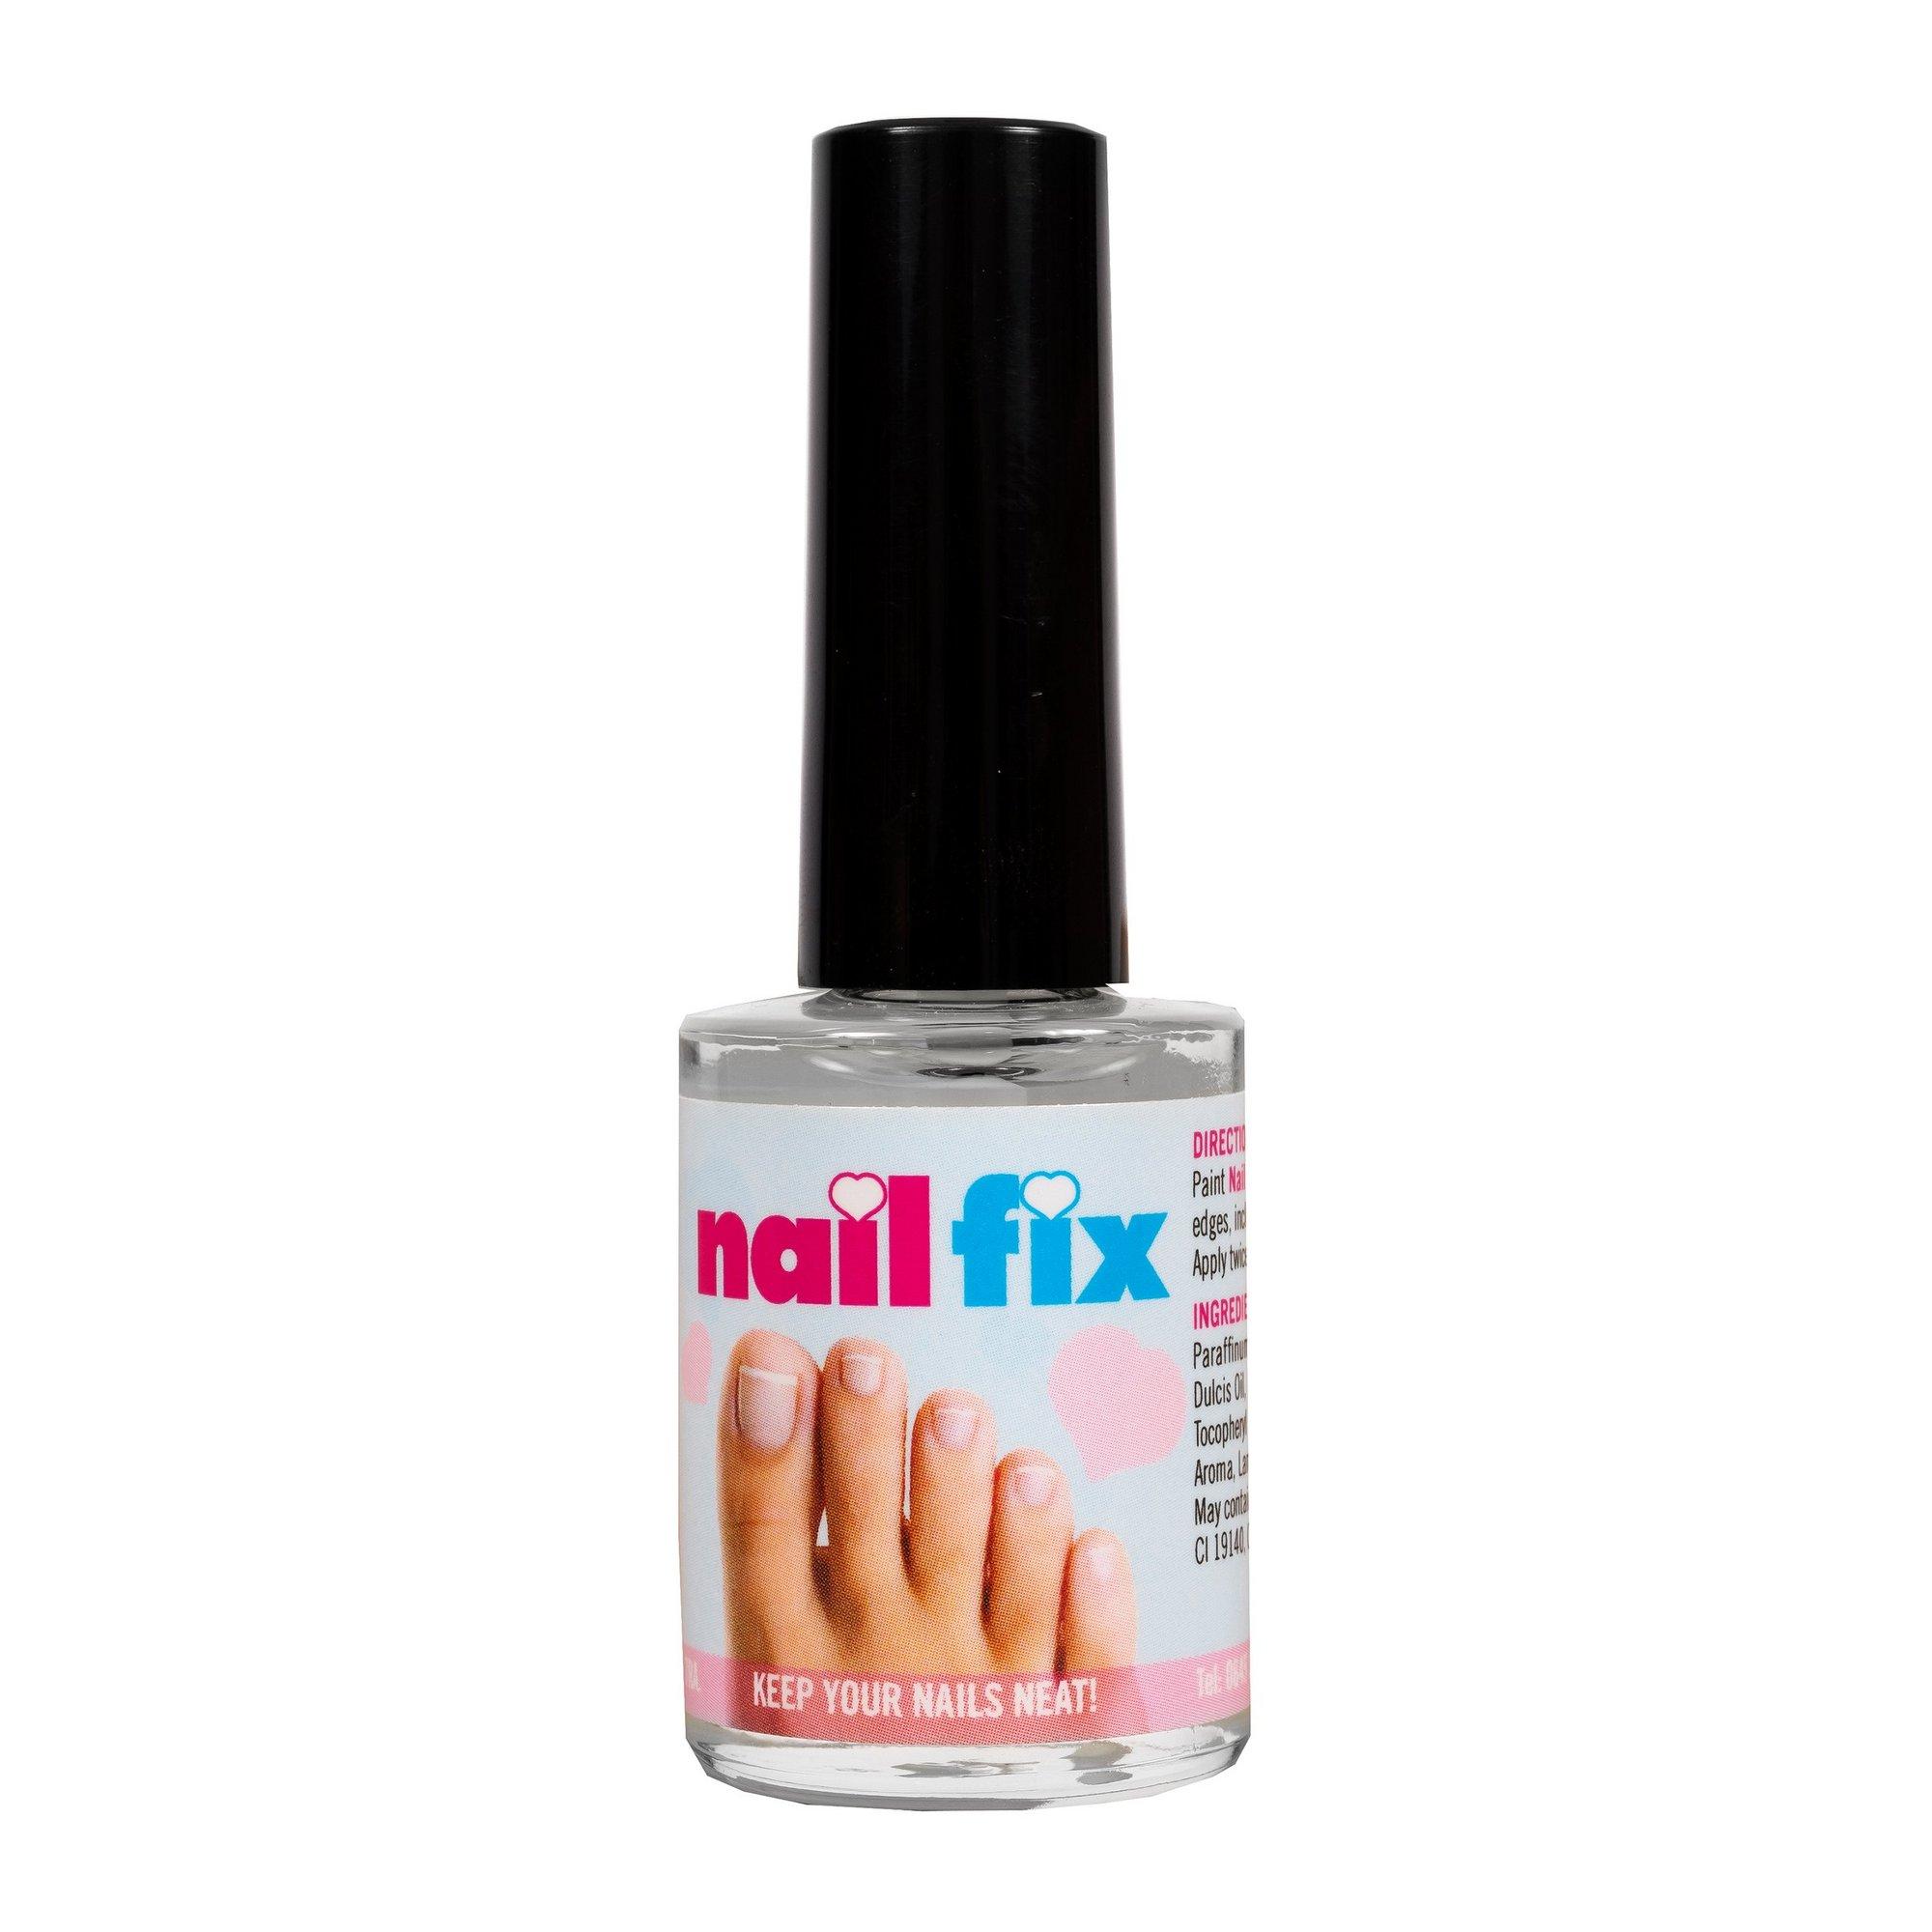 Image of Bioclear Nail Fix Polish